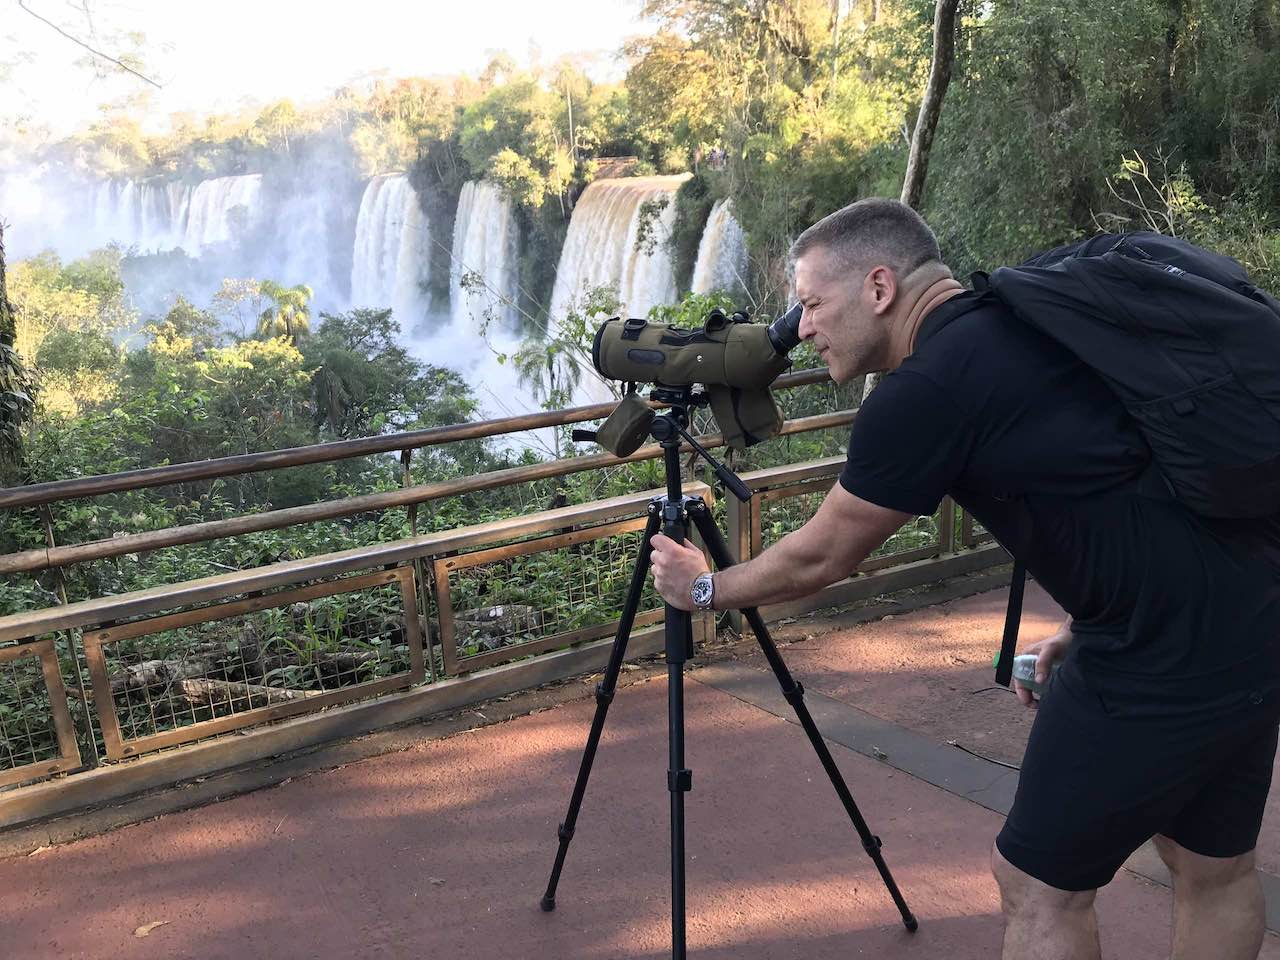 Carlos Melia in Iguazu Argentina